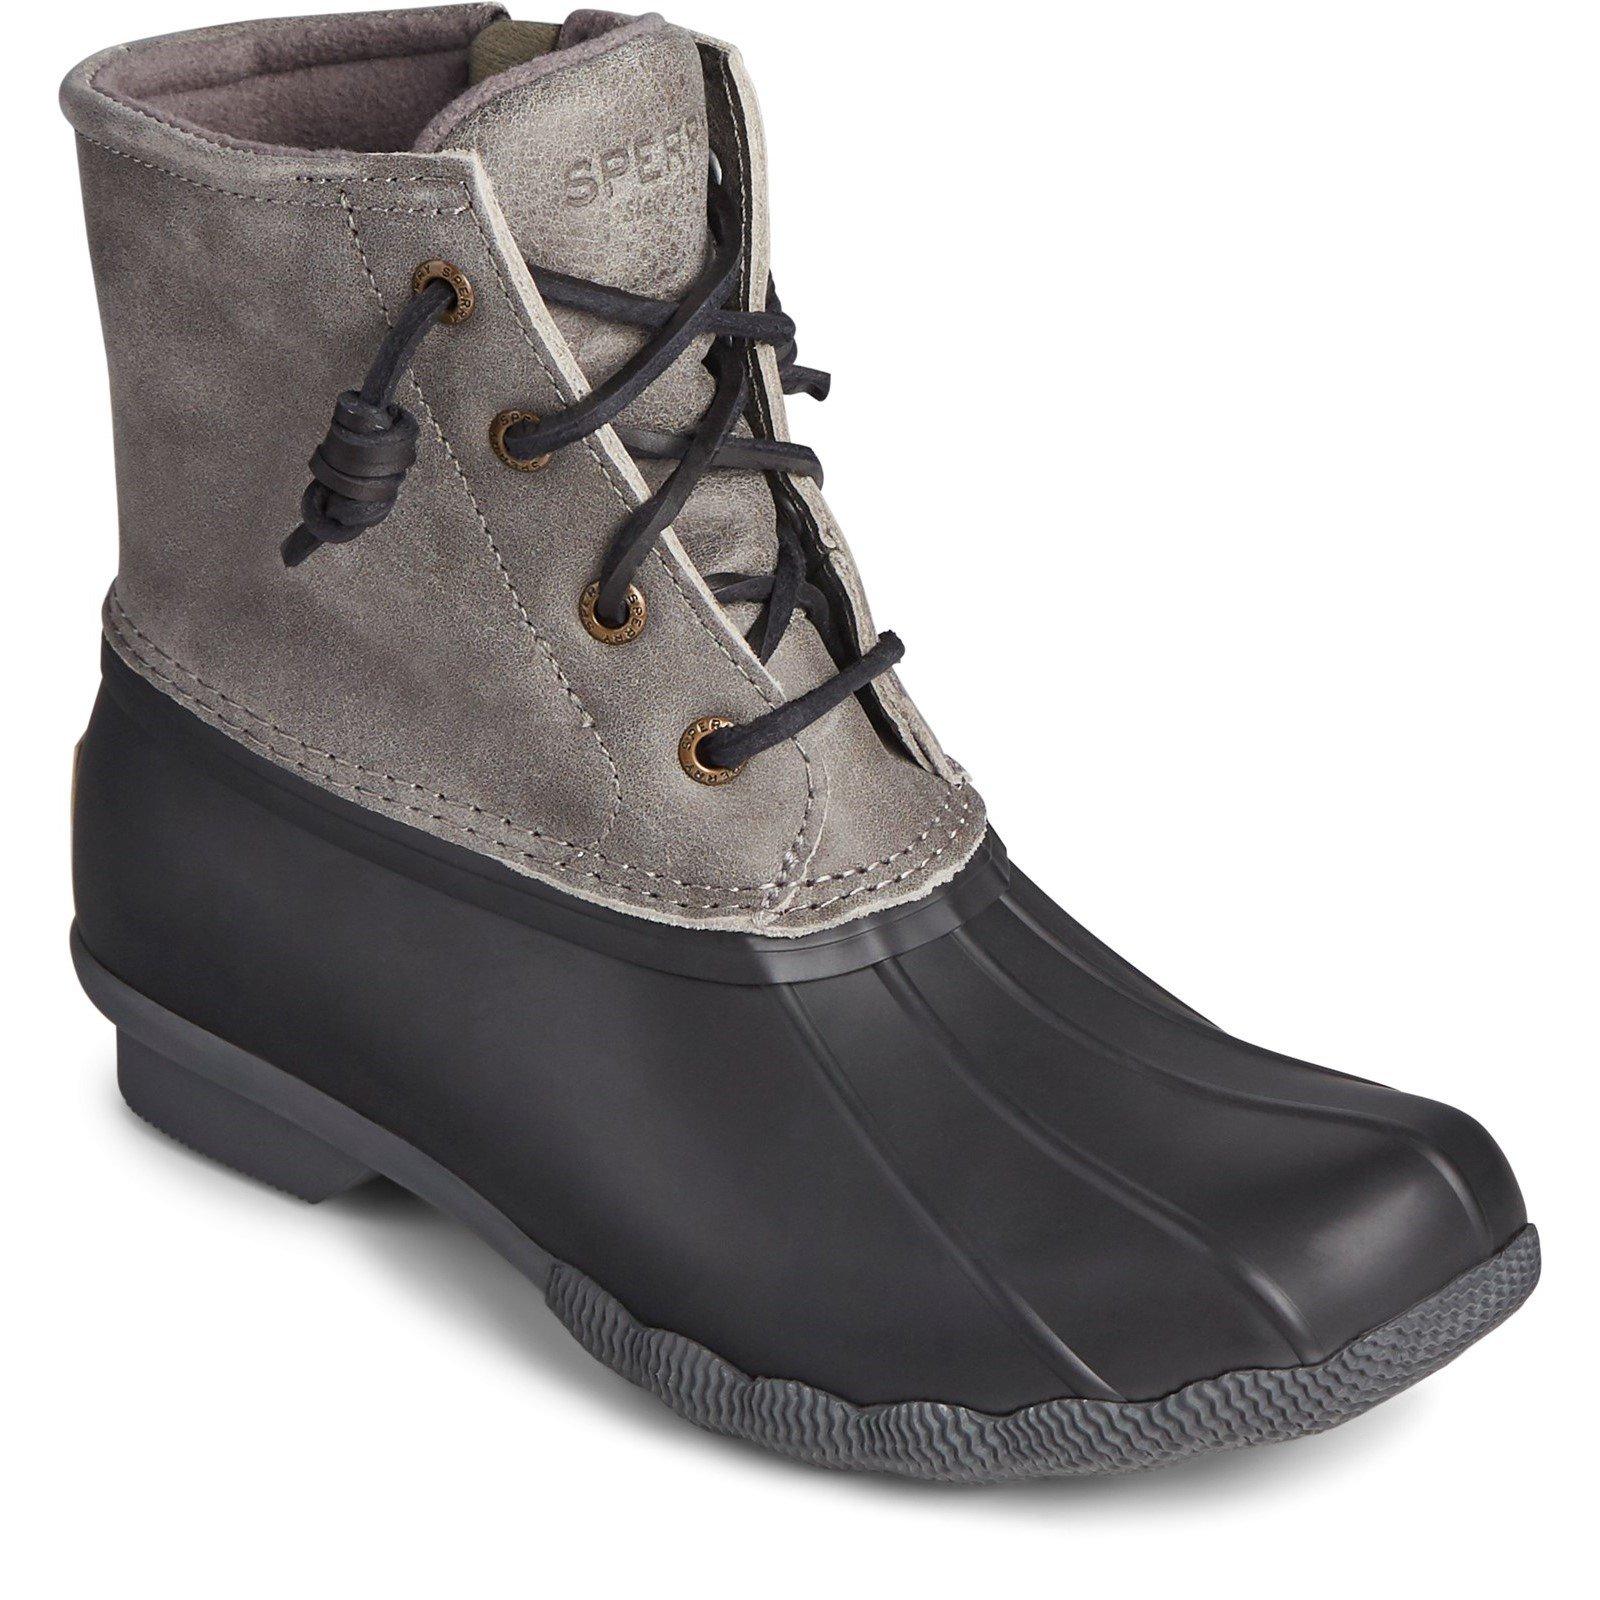 Sperry Women's Saltwater Core Mid Boot Multicolor 32407 - Black/Grey 3